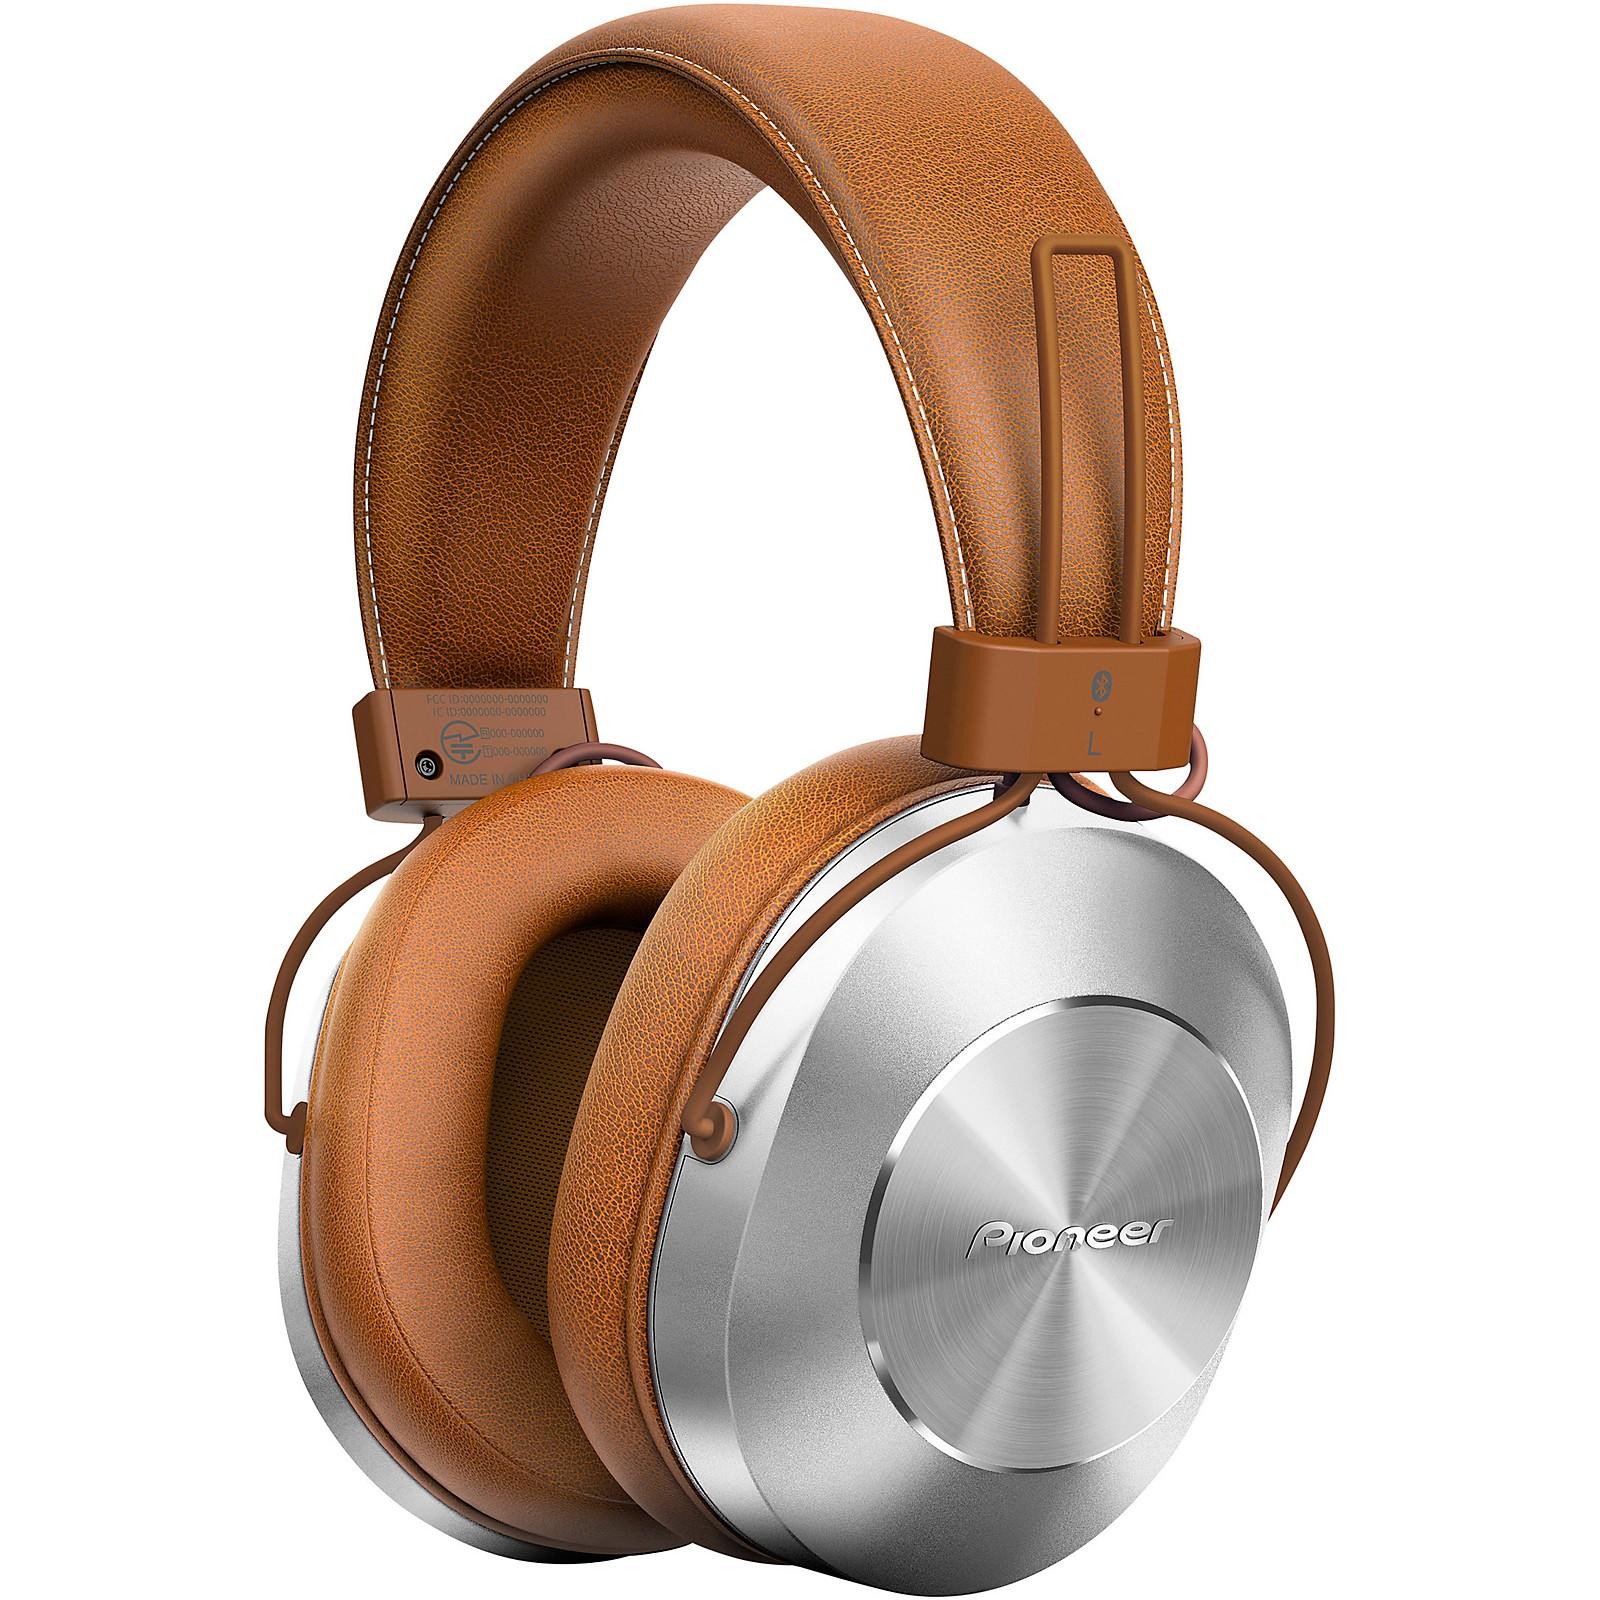 Pioneer SE-MS7BT-T Wireless/Wired Stereo Headphones